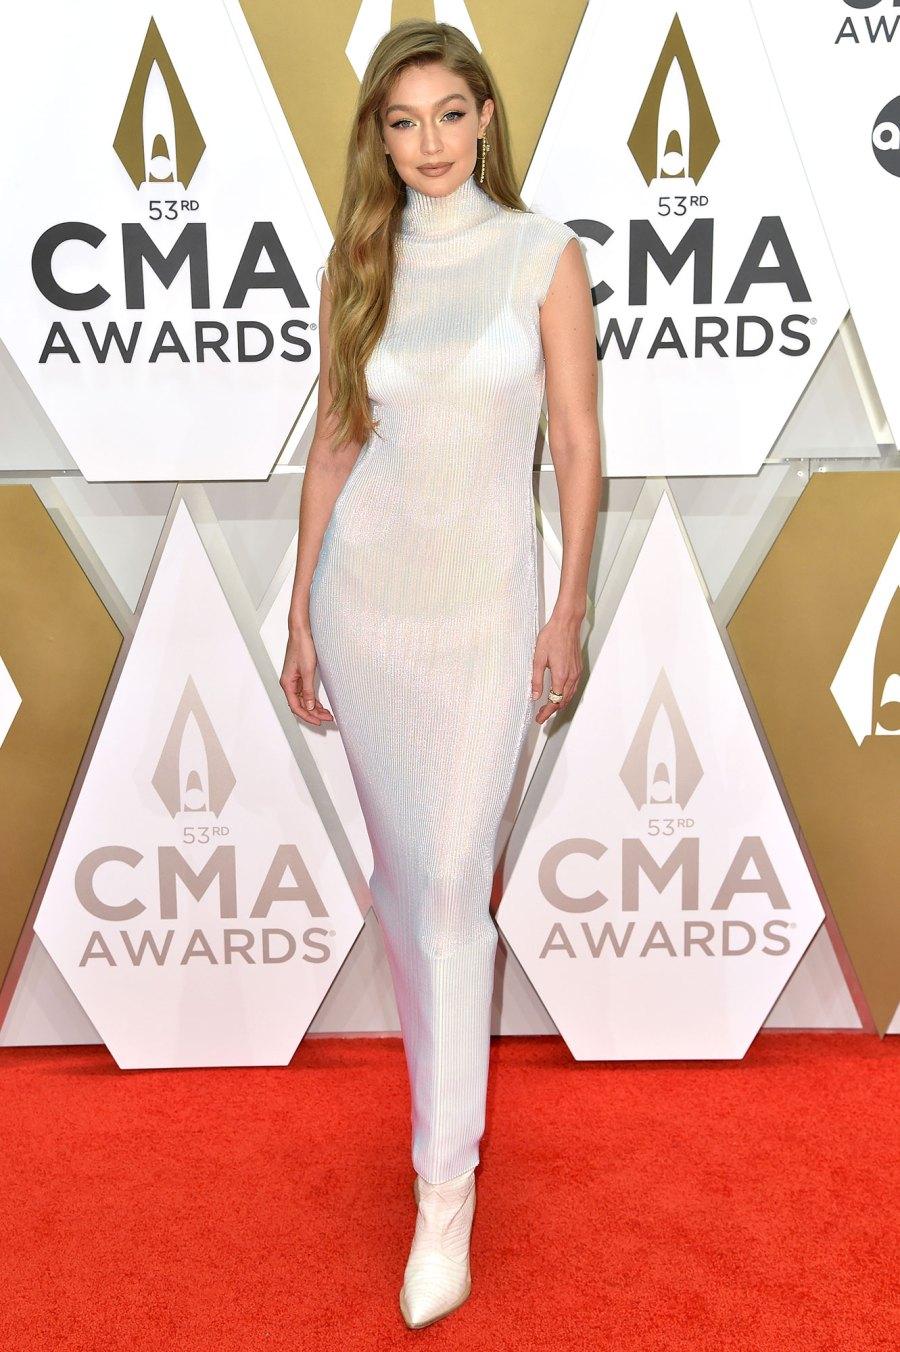 Gigi Hadid Revealed Her Biggest Pregnancy Cravings